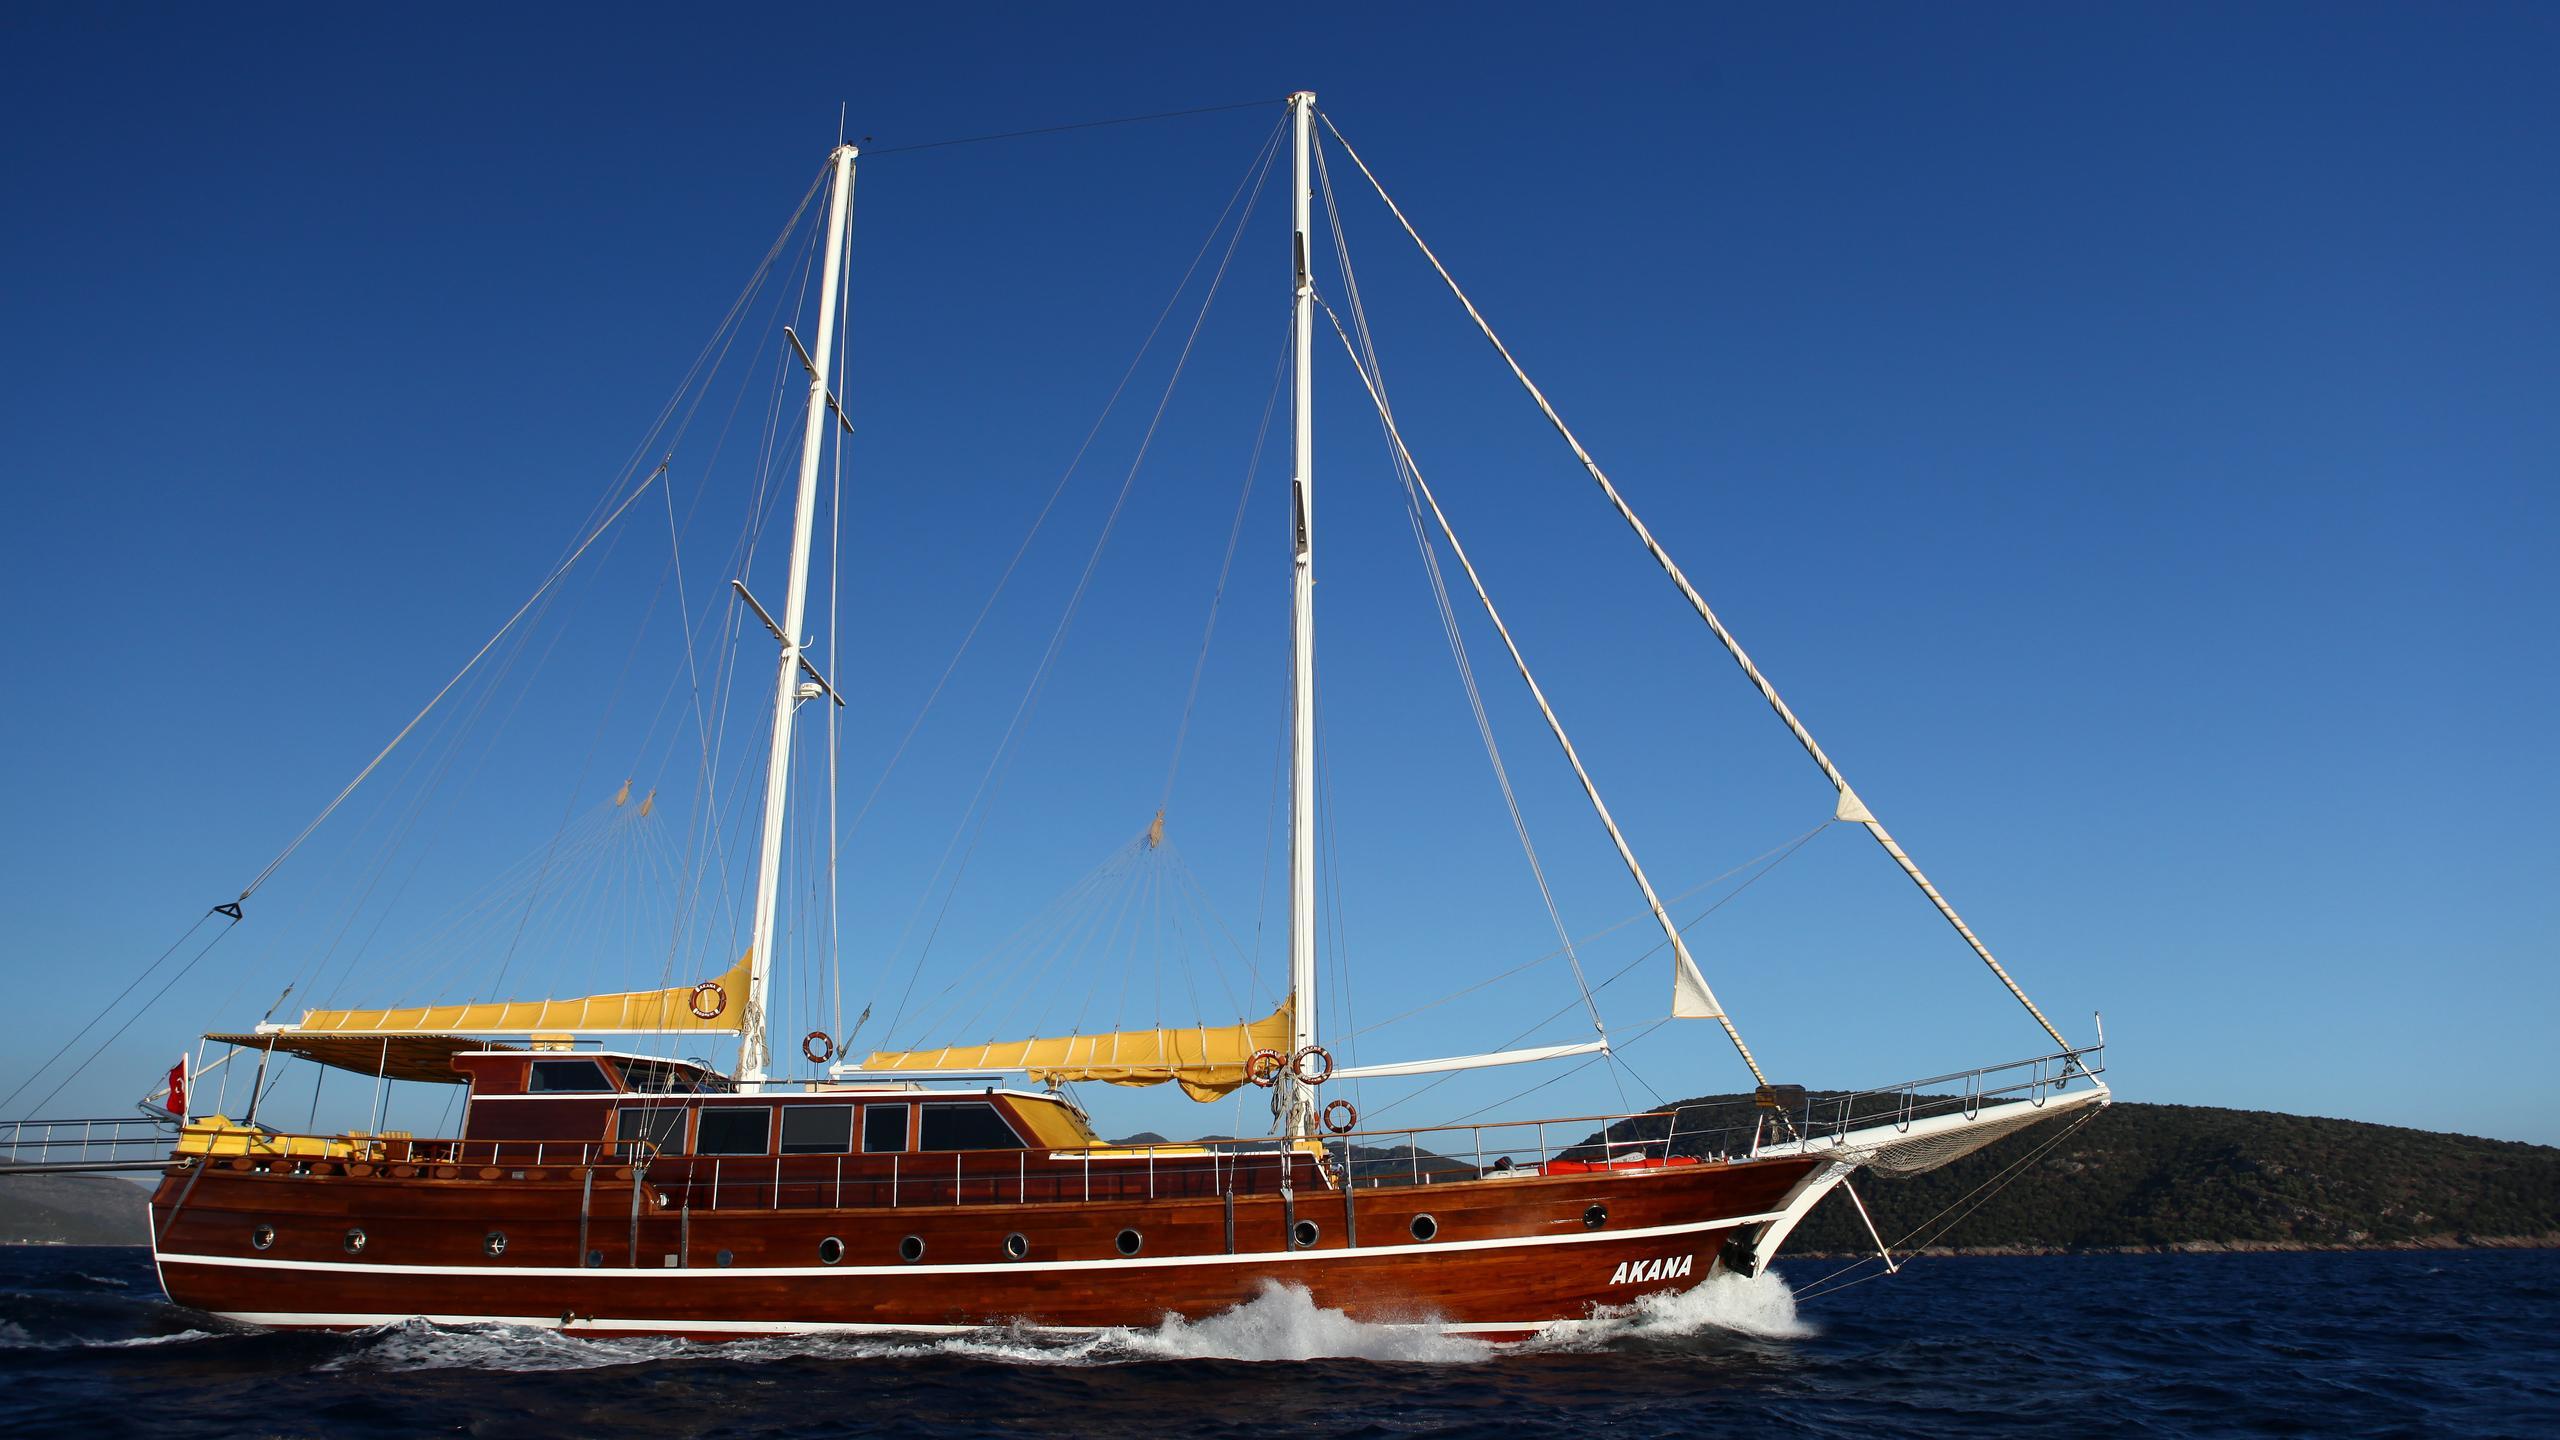 akana-yacht-for-charter-profile